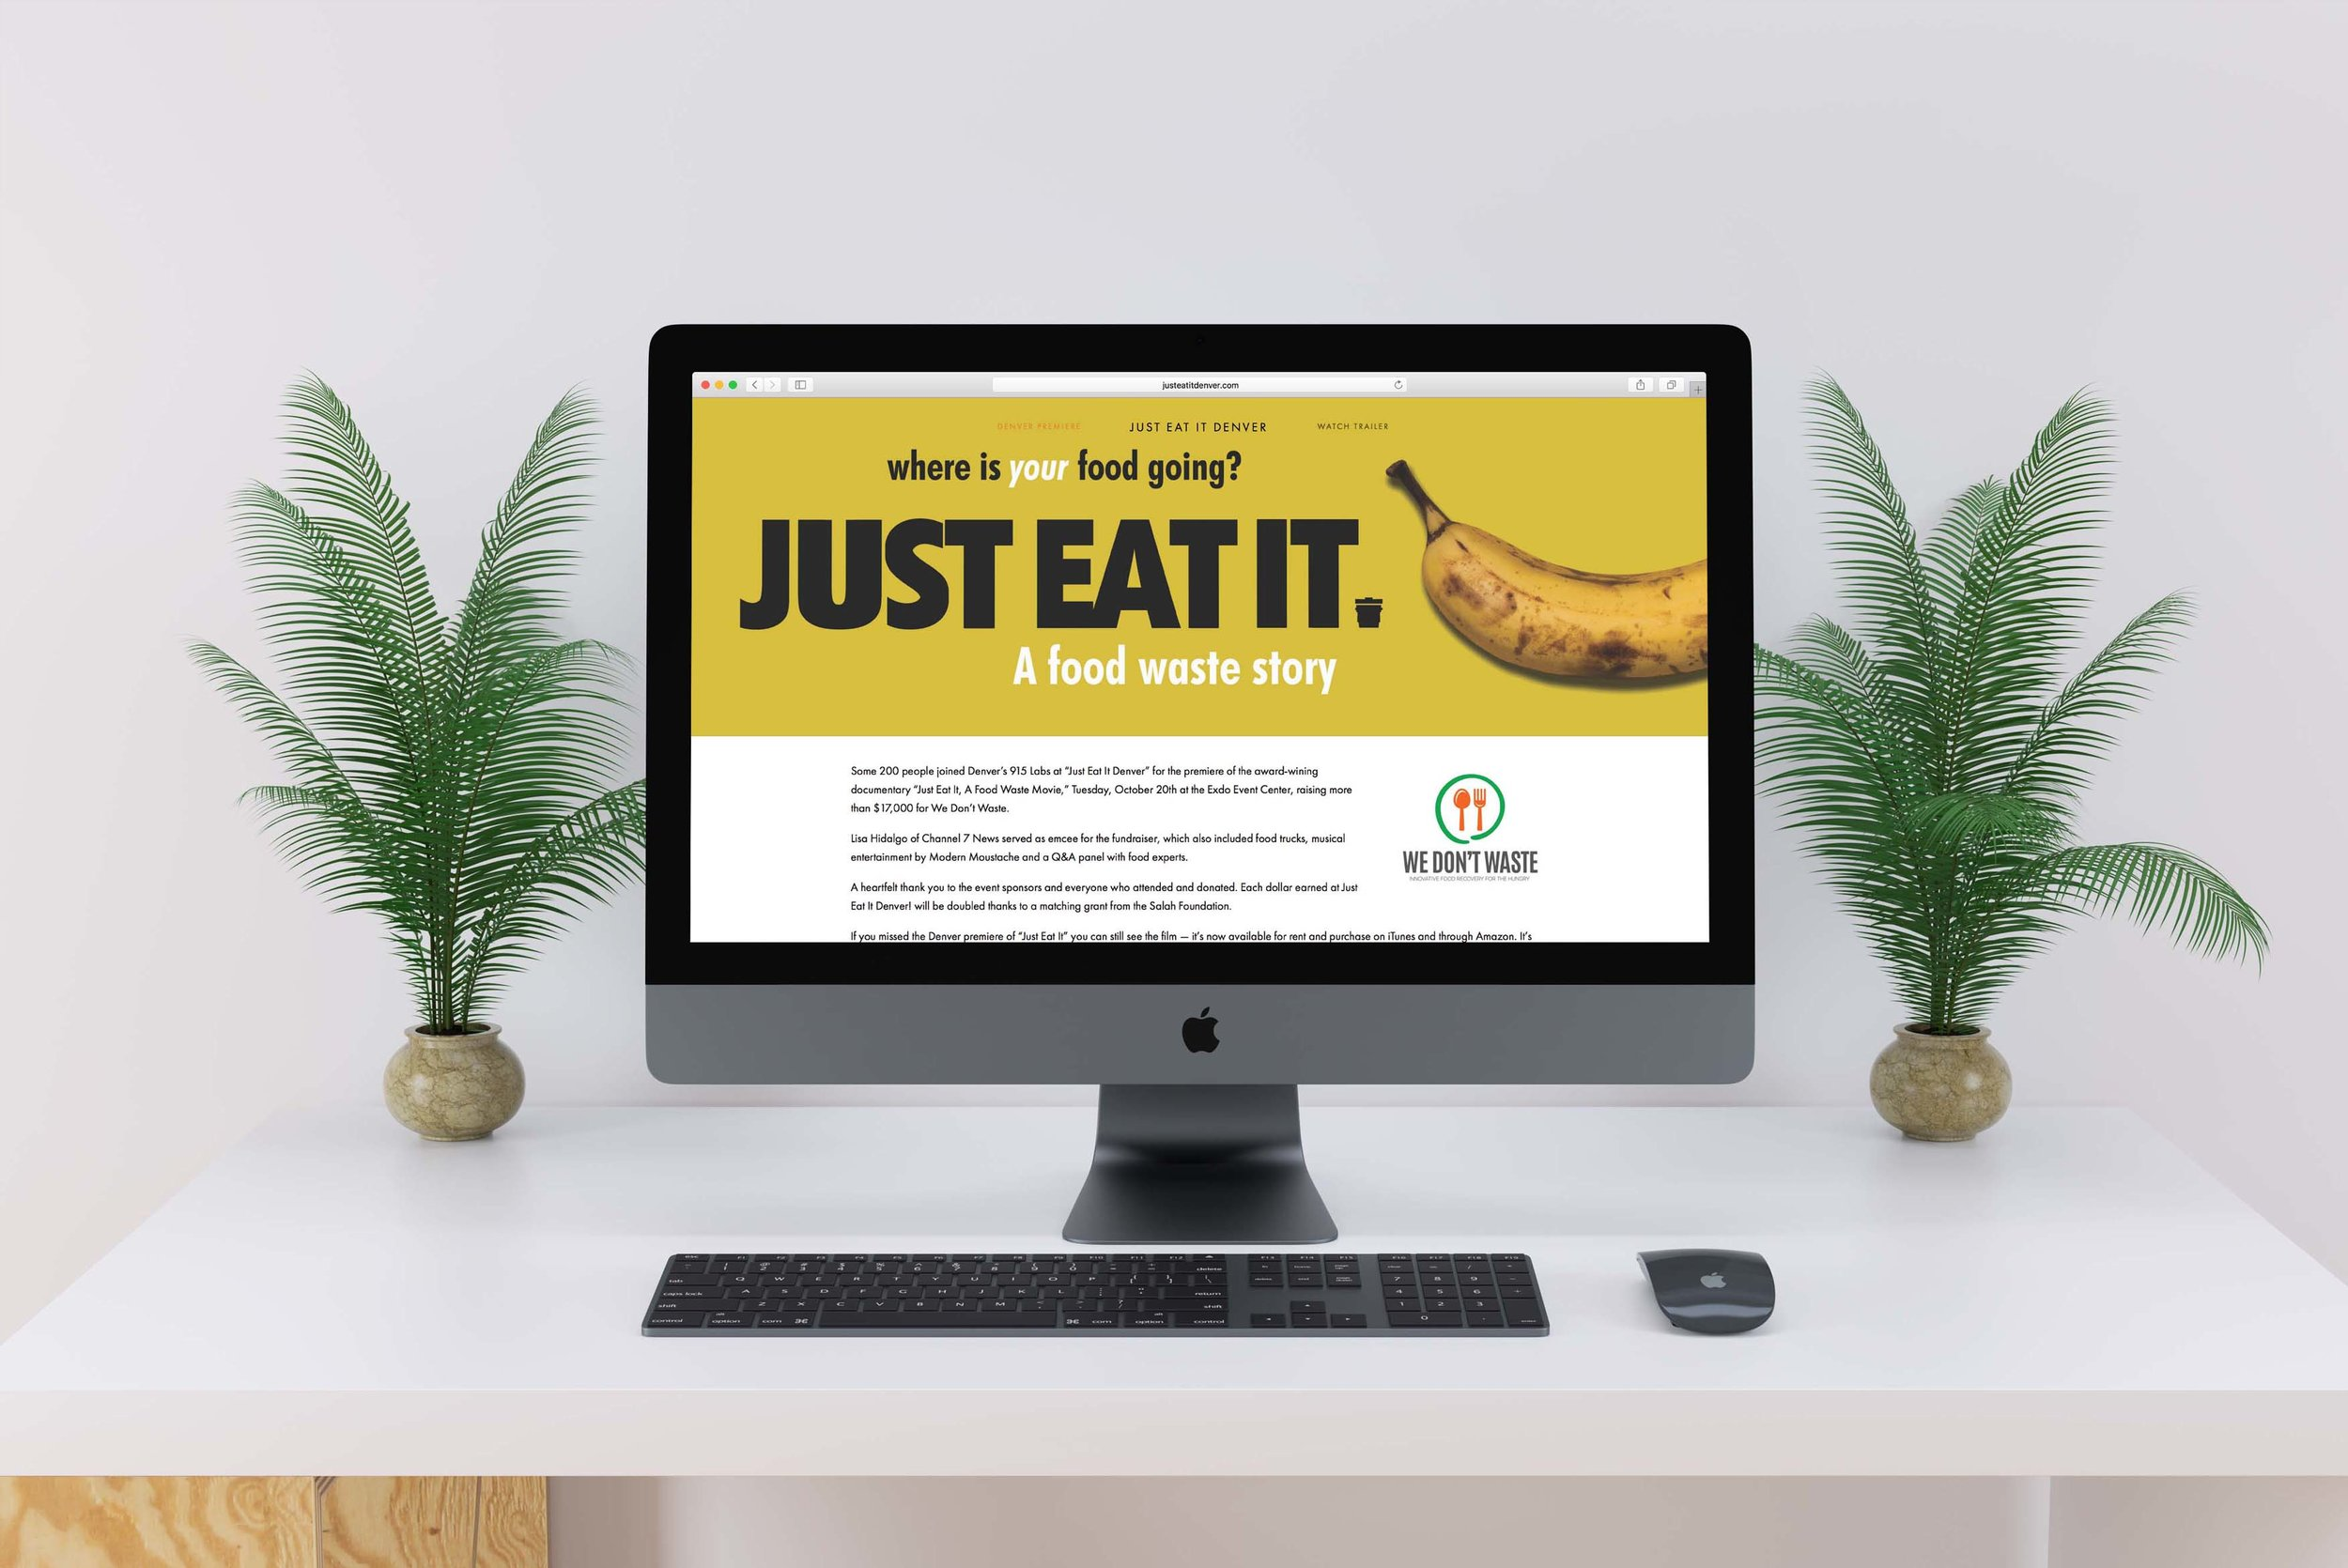 just_eat_it_denver_web.jpg